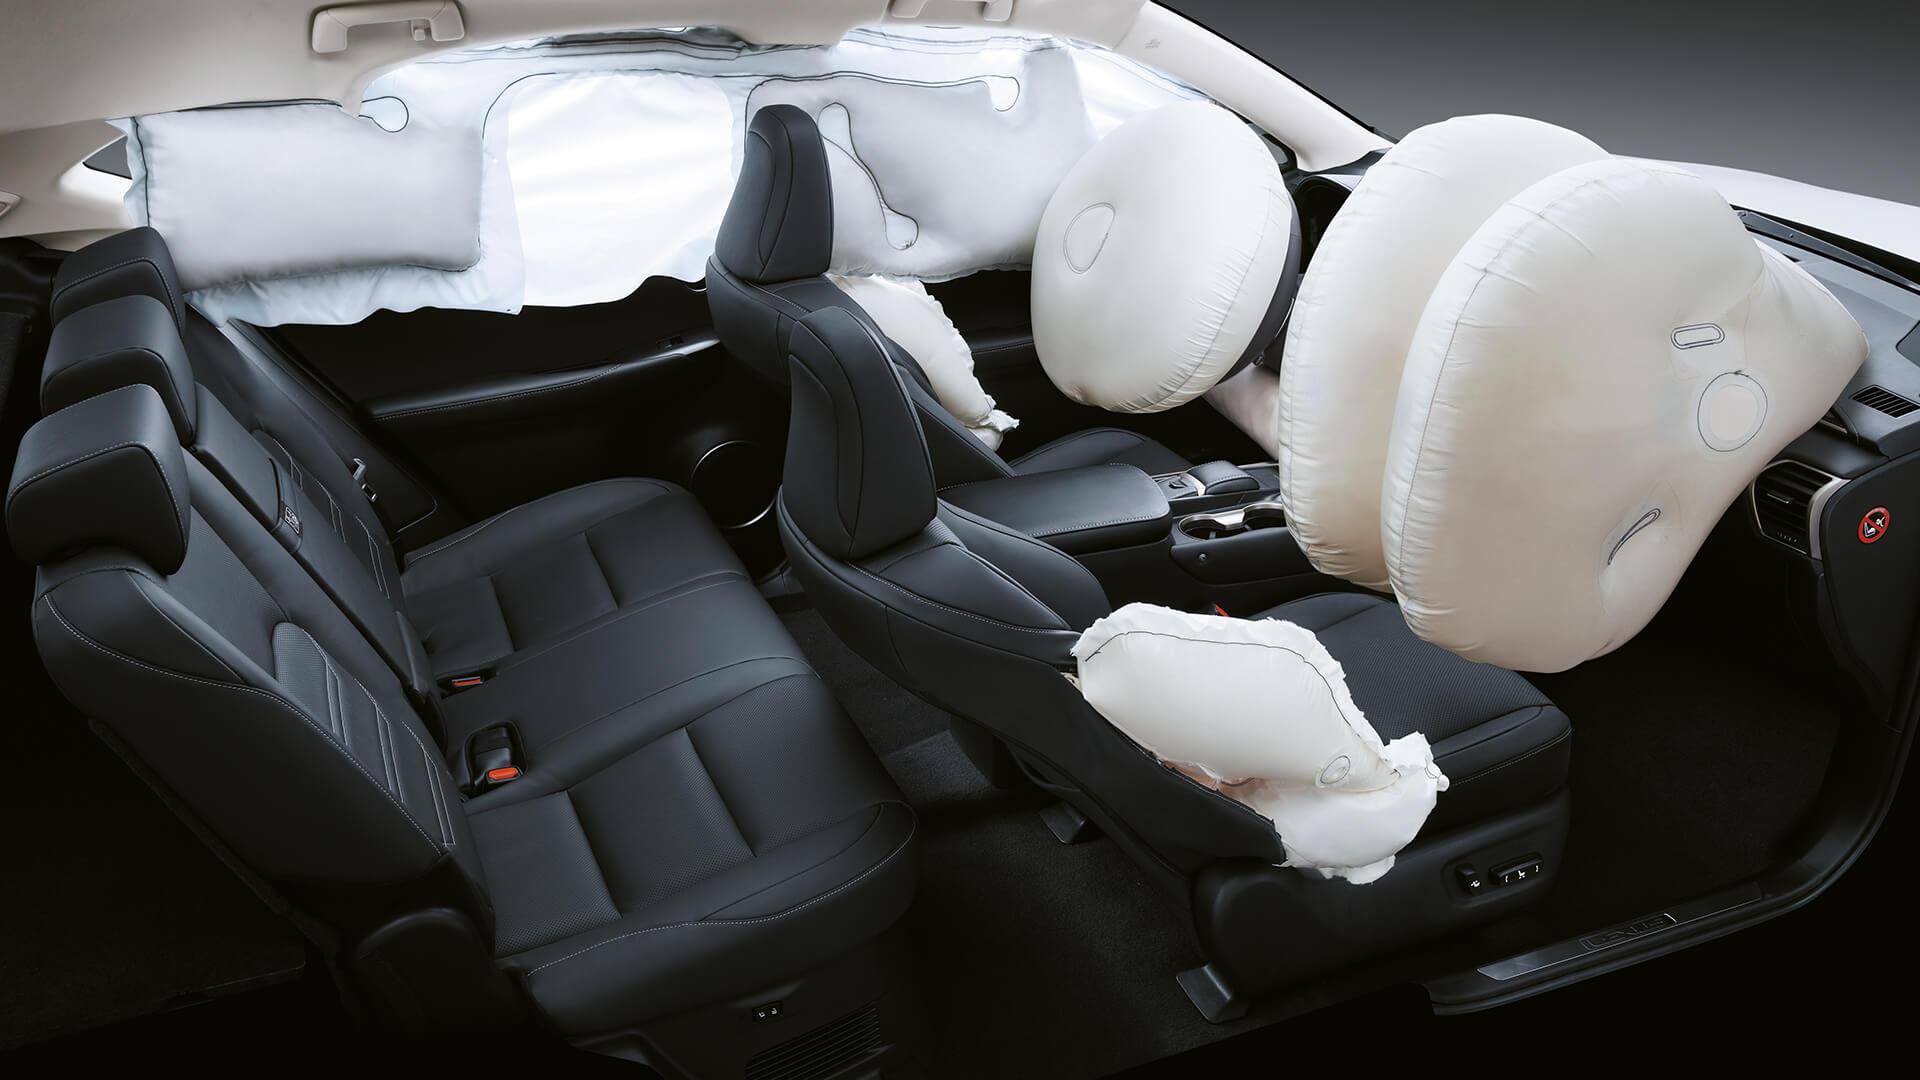 2020 lexus nx hotspot 8 airbags